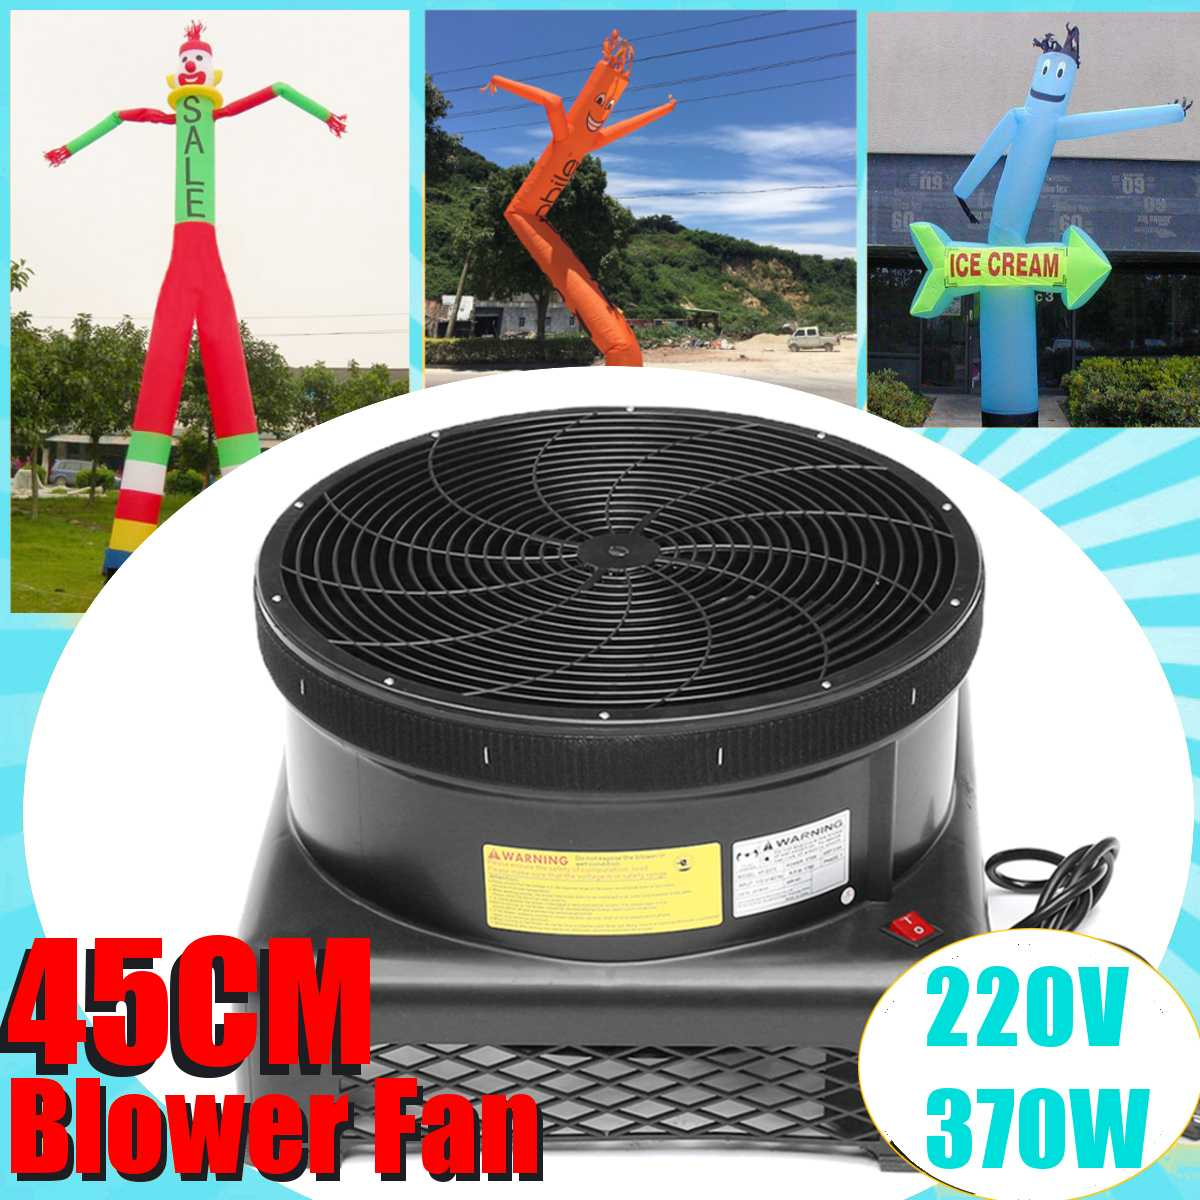 220V 370W Commercial Air Blower Fan Wind Blower Stream Fan for Inflatable Tube Man Puppet 4m 2 Legs 3m Single Leg air Dancer